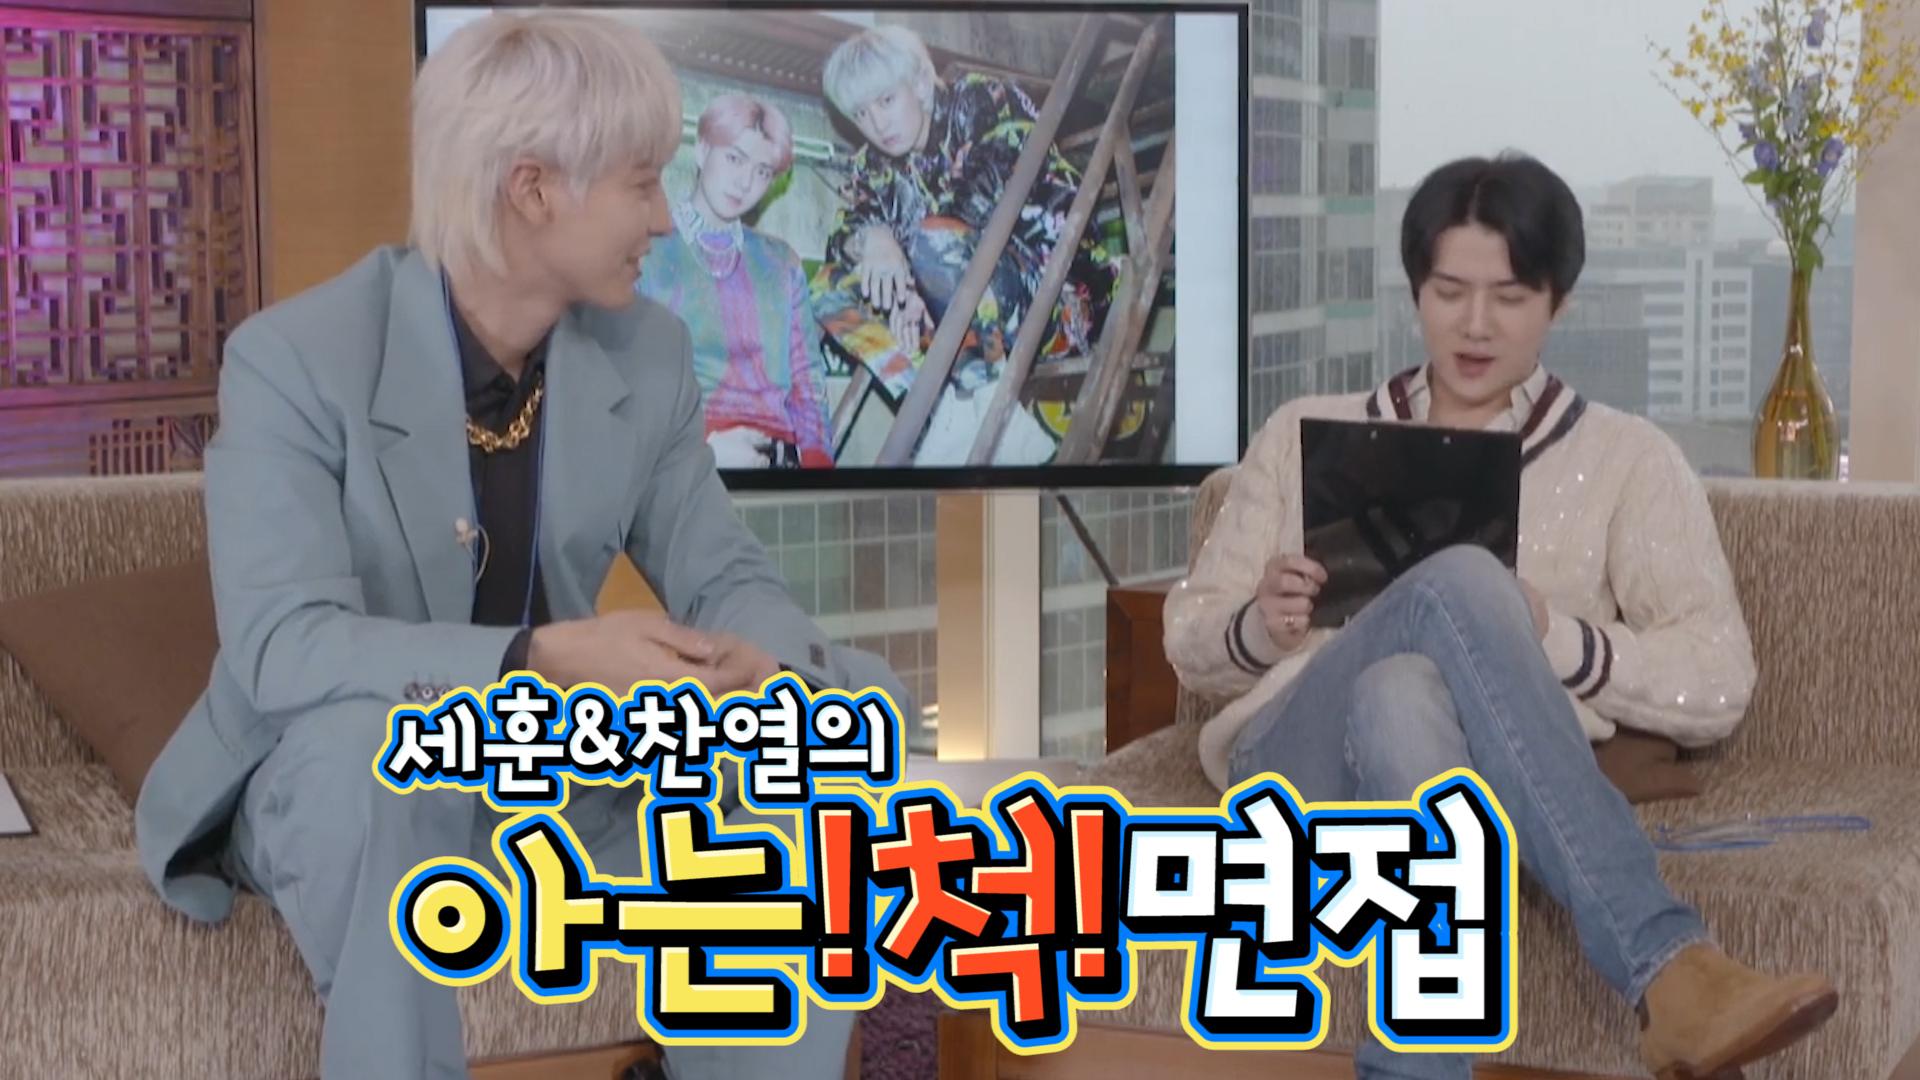 [EXO] 세찬이라면 면접 보는 ‼️척‼️만 해도 합격 아니었나👍 (EXO-SC's interview role play)